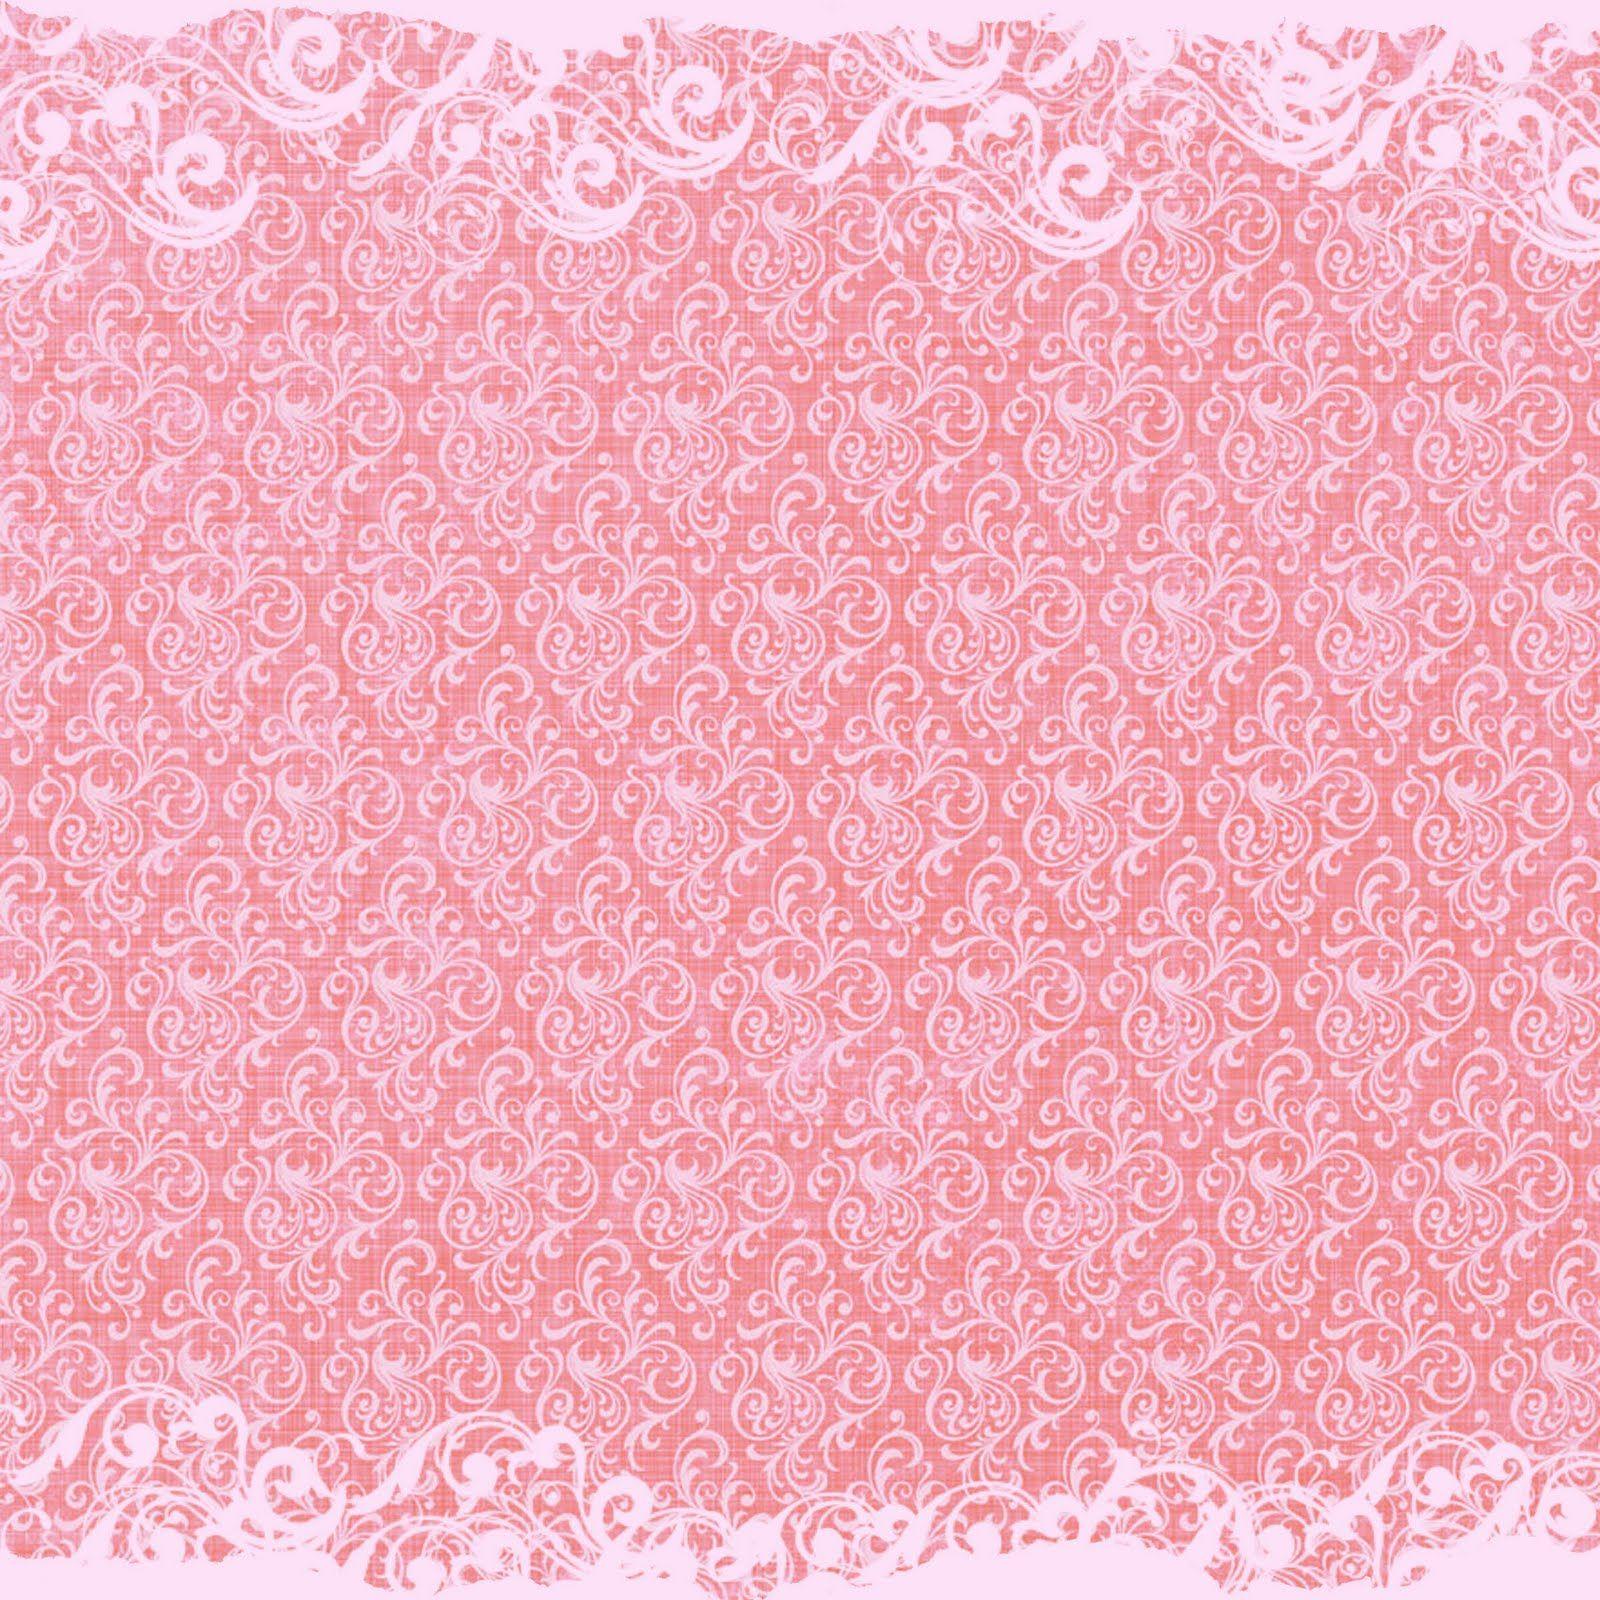 Free Digital Scrapbook Paper Pink Swirls Disenos Scrapbook